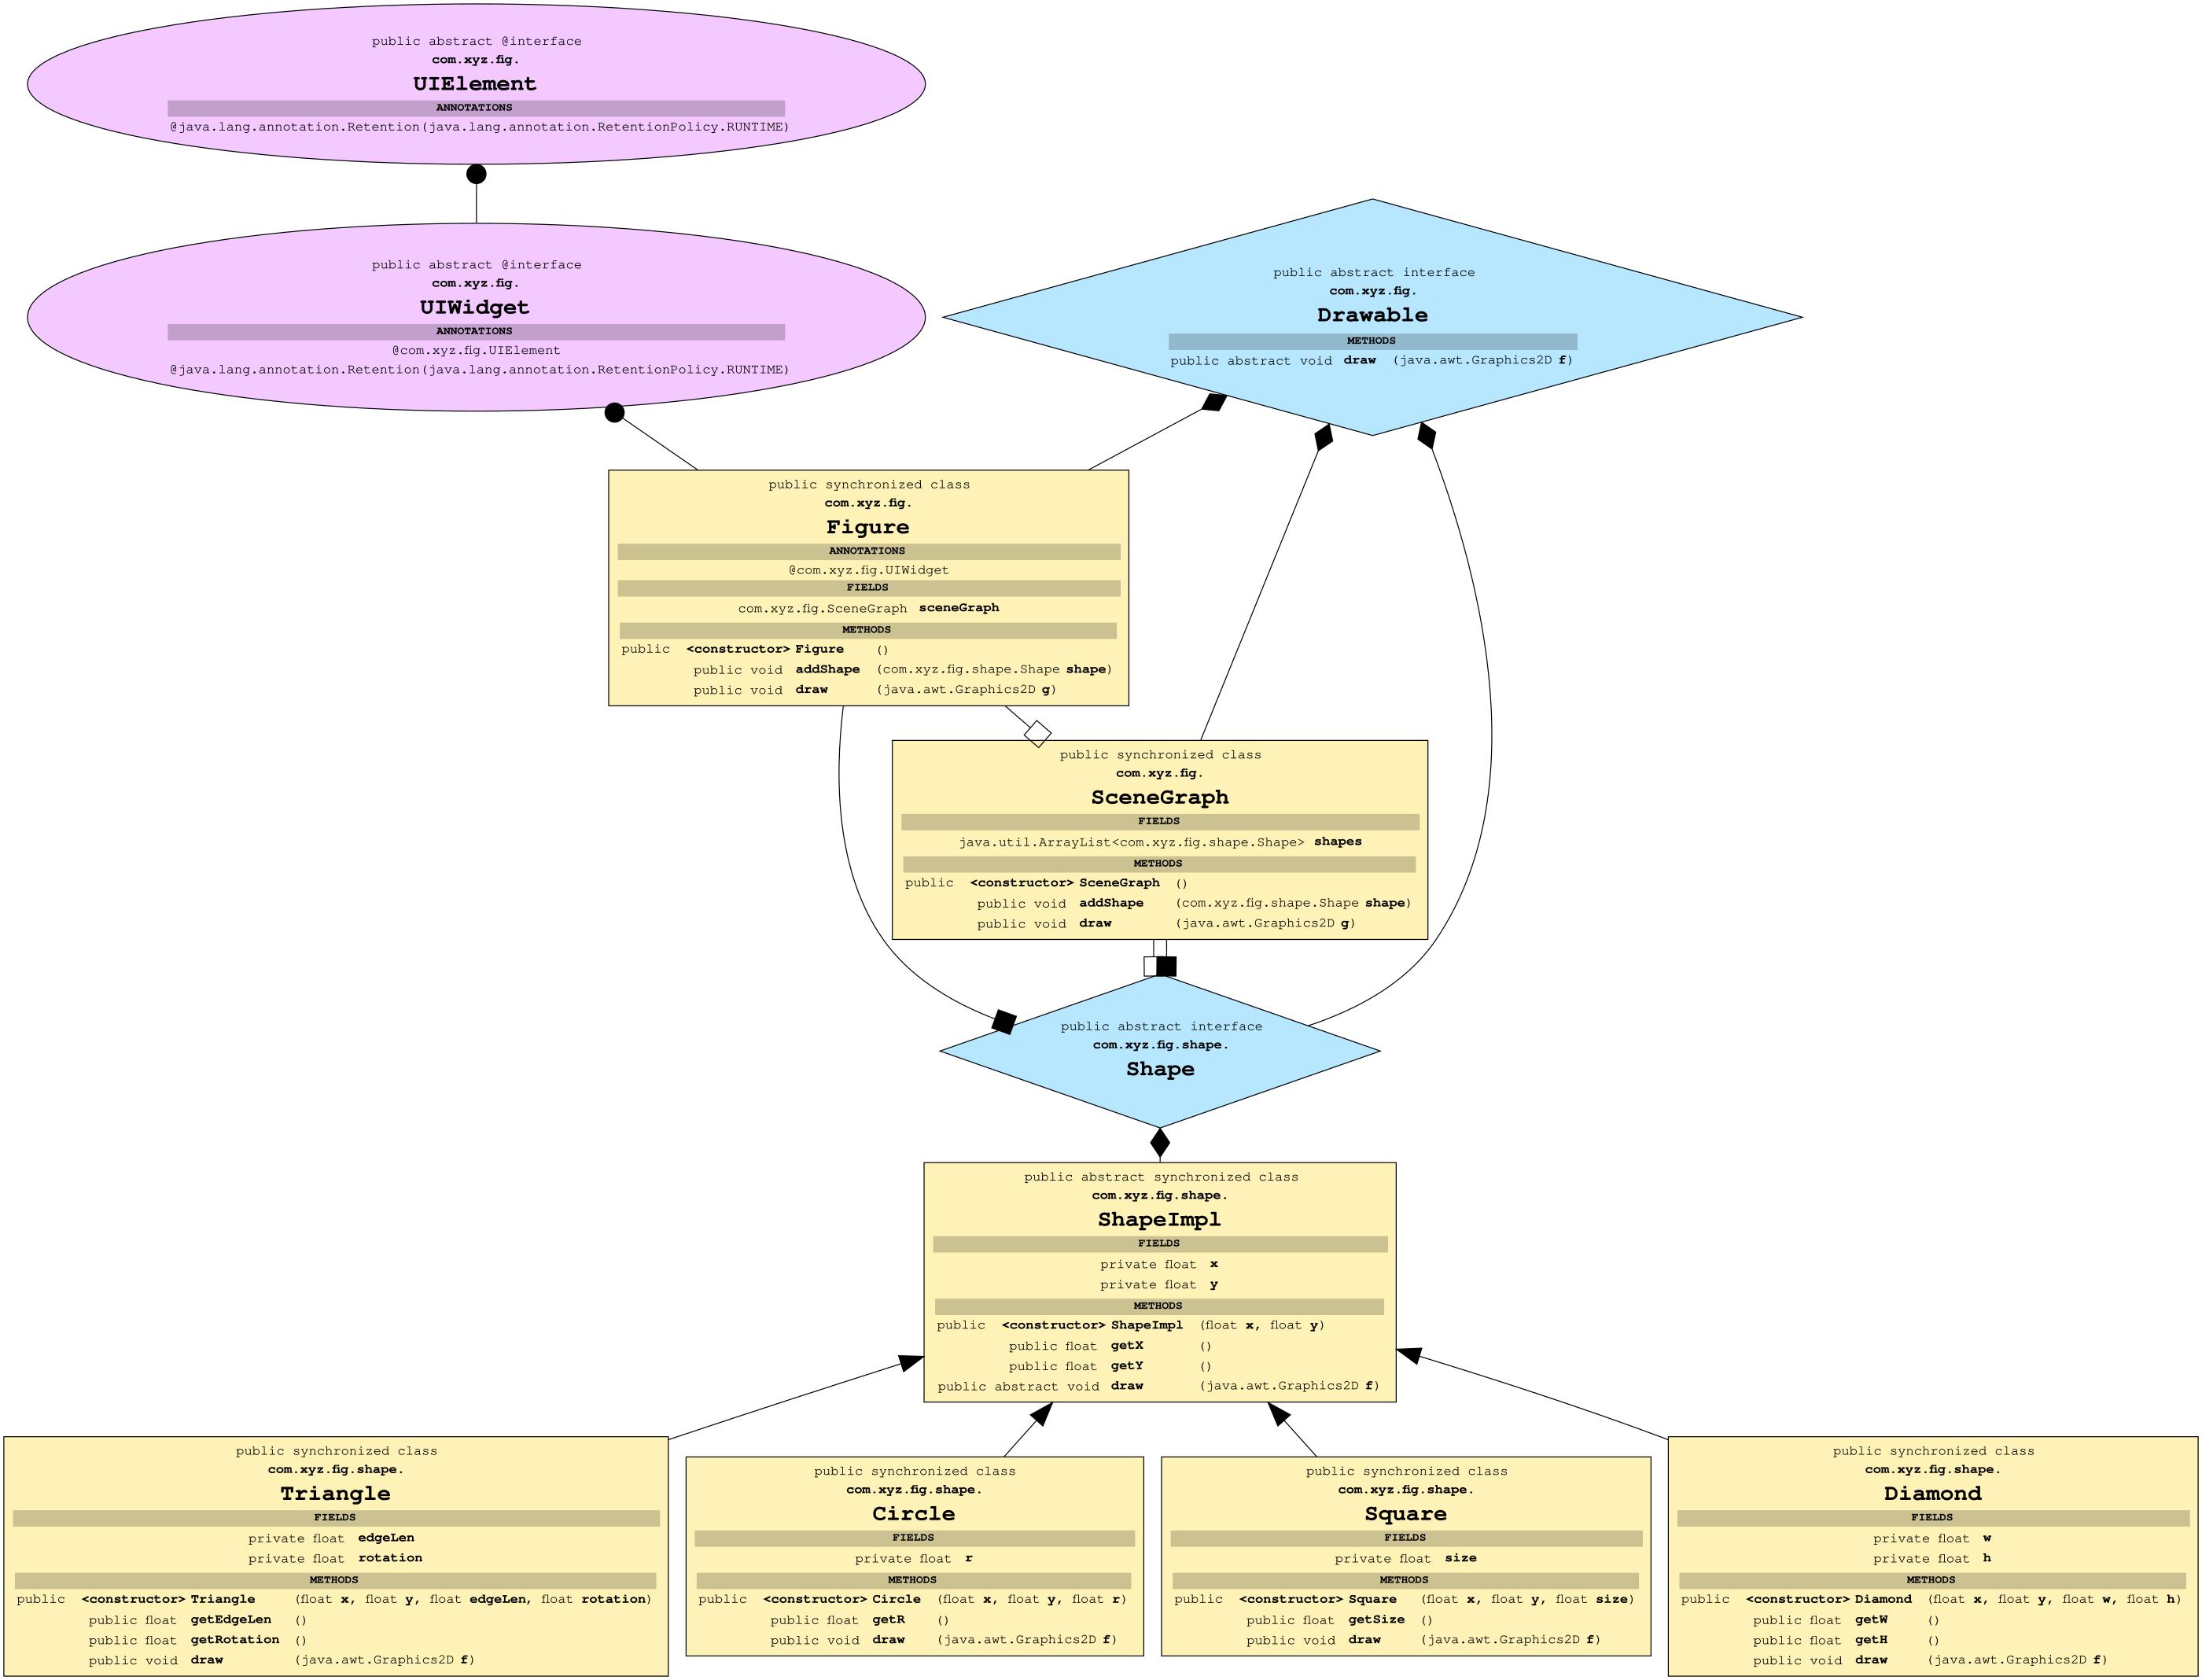 Class graph visualization